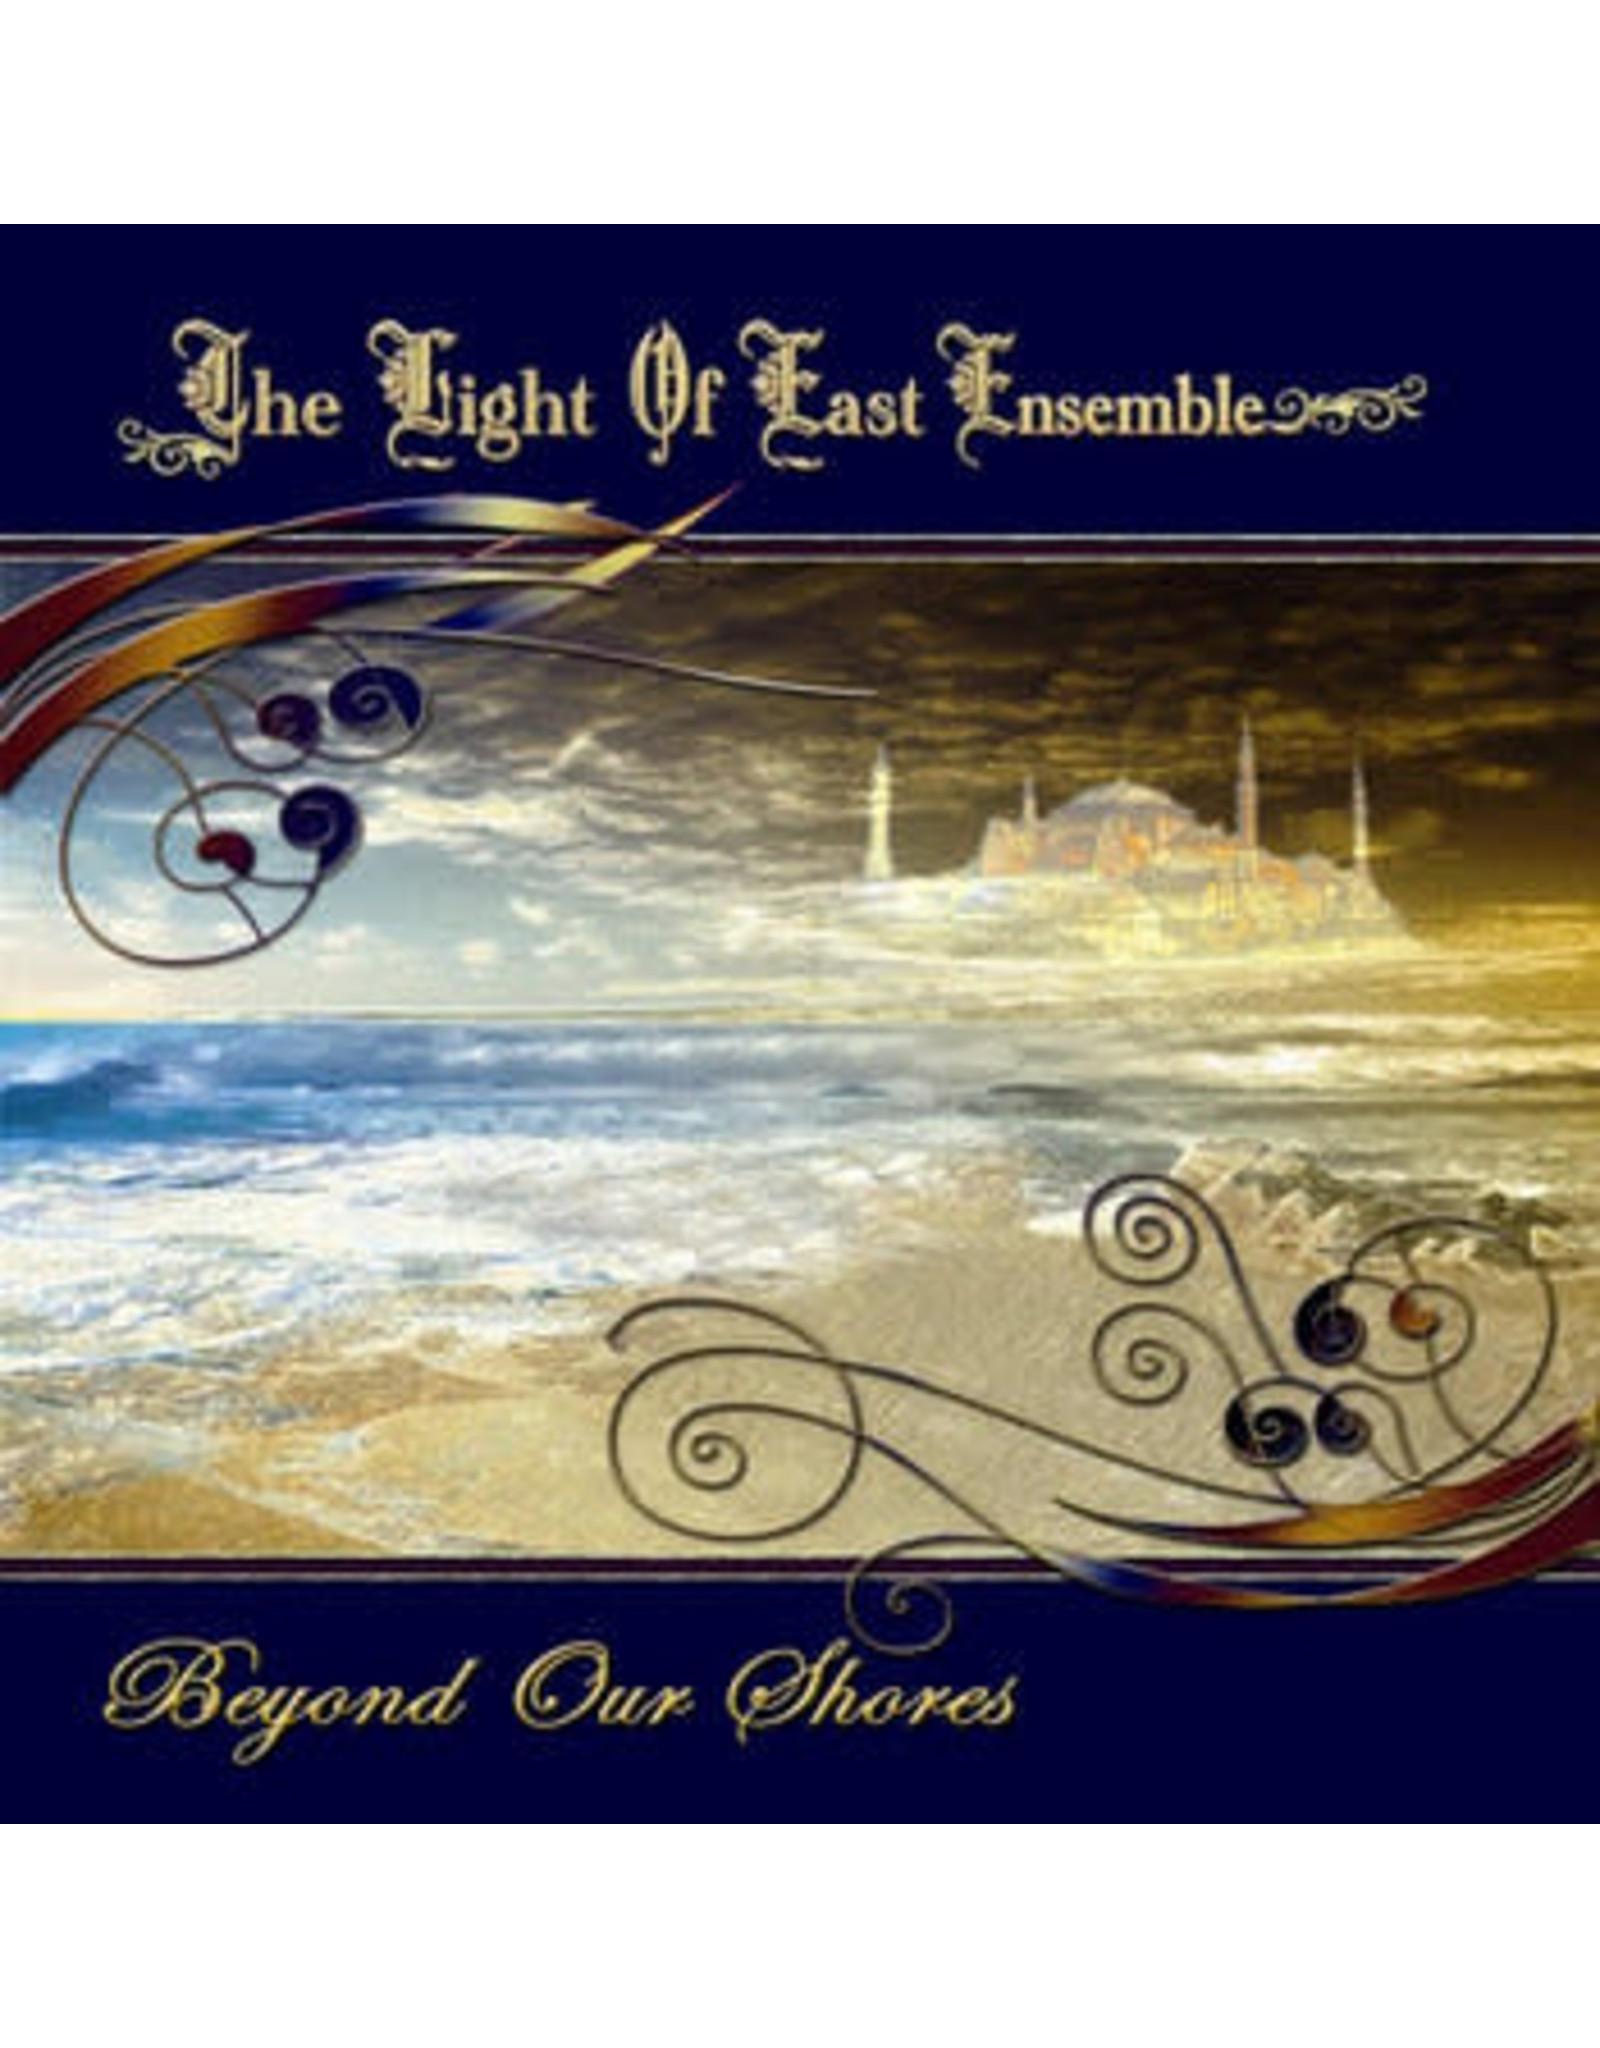 Light of East Ensemble - Beyond Our Shores CD